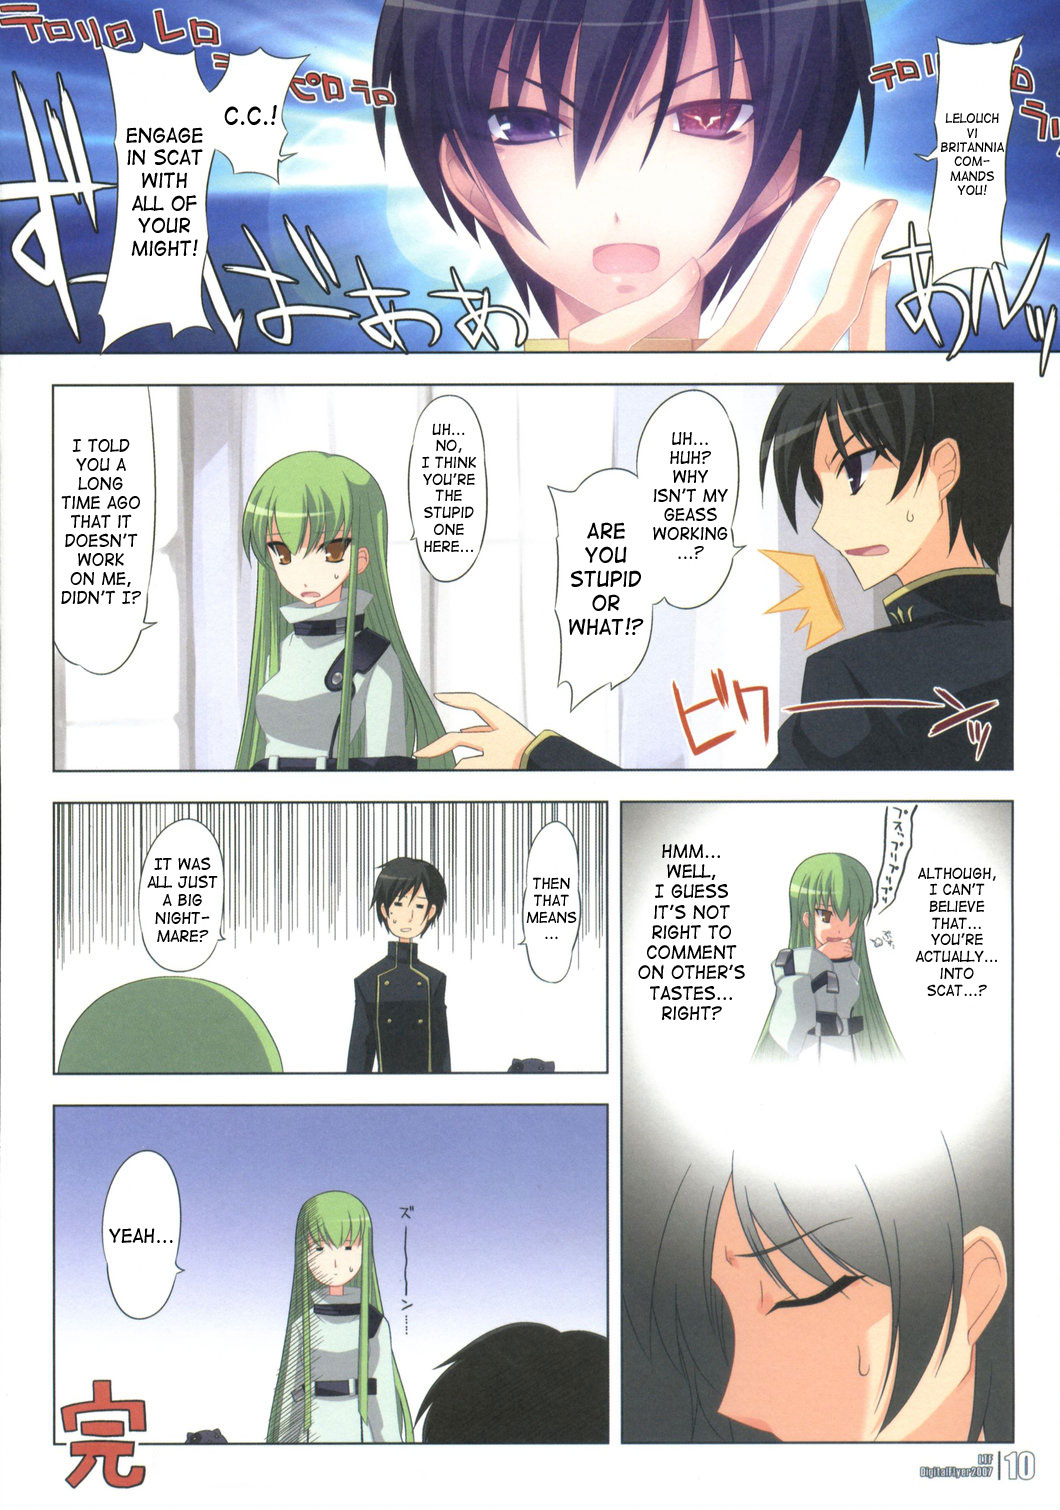 DoujinReader.com [SaHa] Lelouch The Fullpower 10